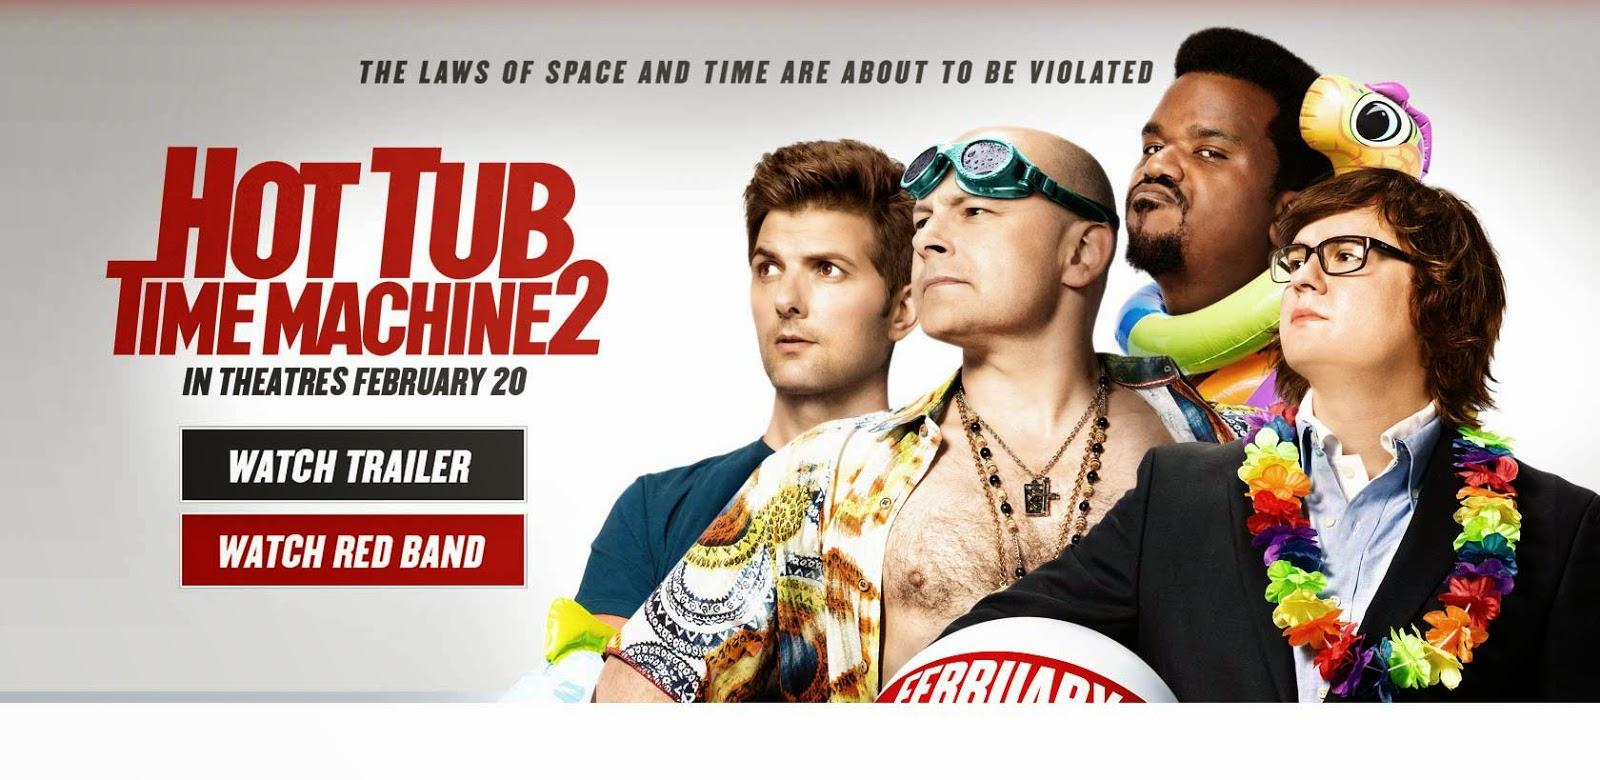 tub time machine 2 poster